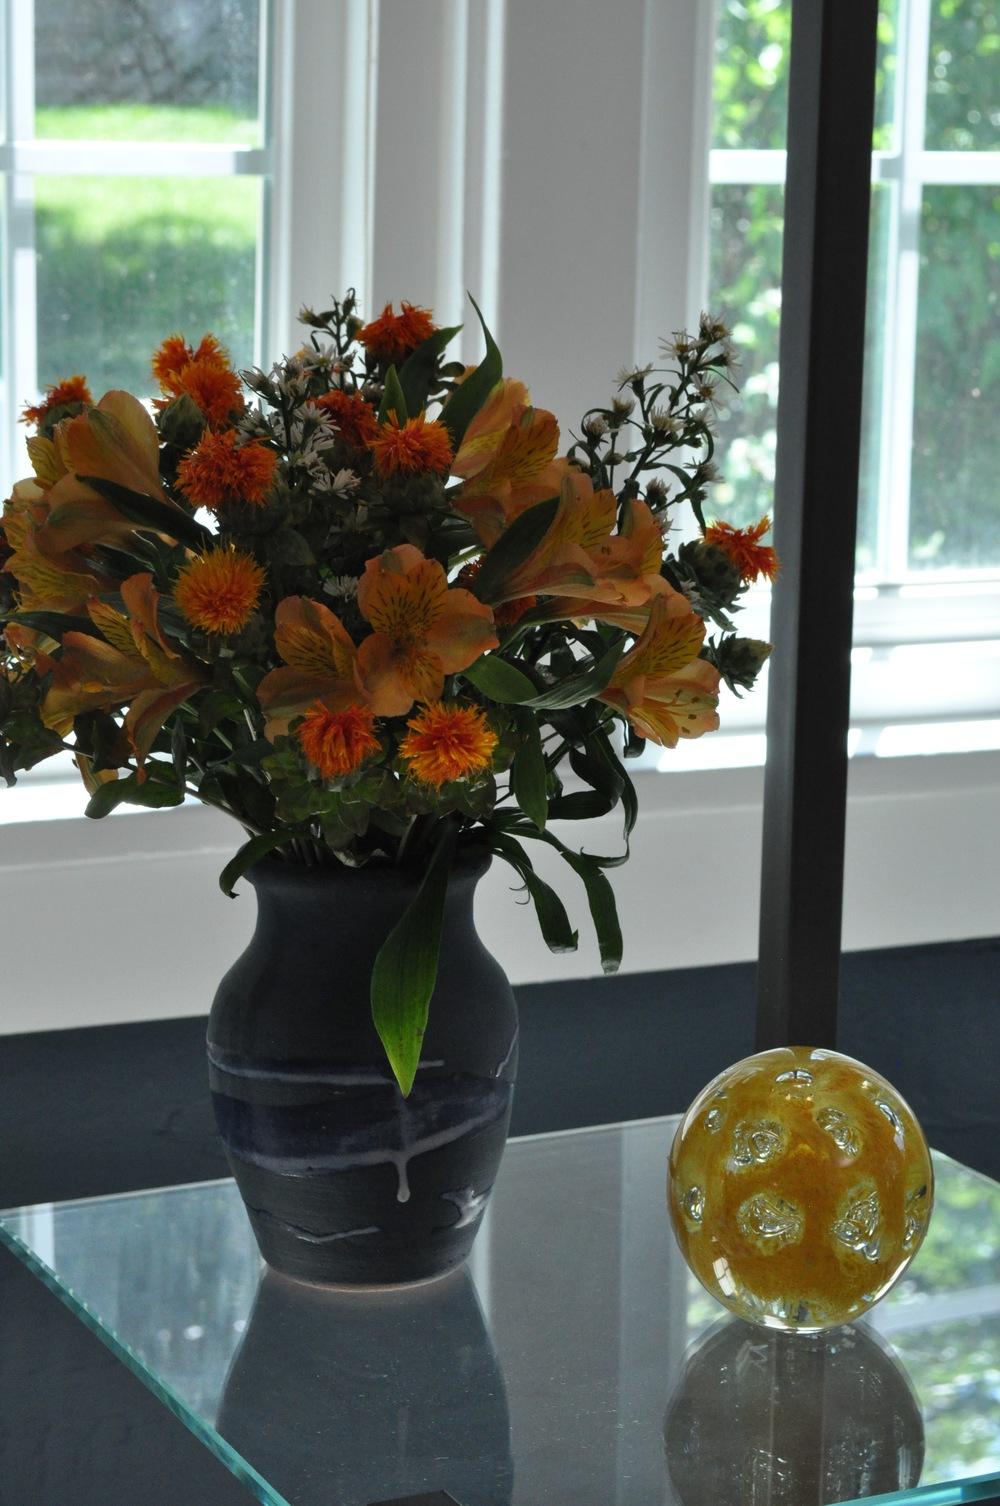 #321_Office_OrangeFlowersCloseUp - 1.jpg